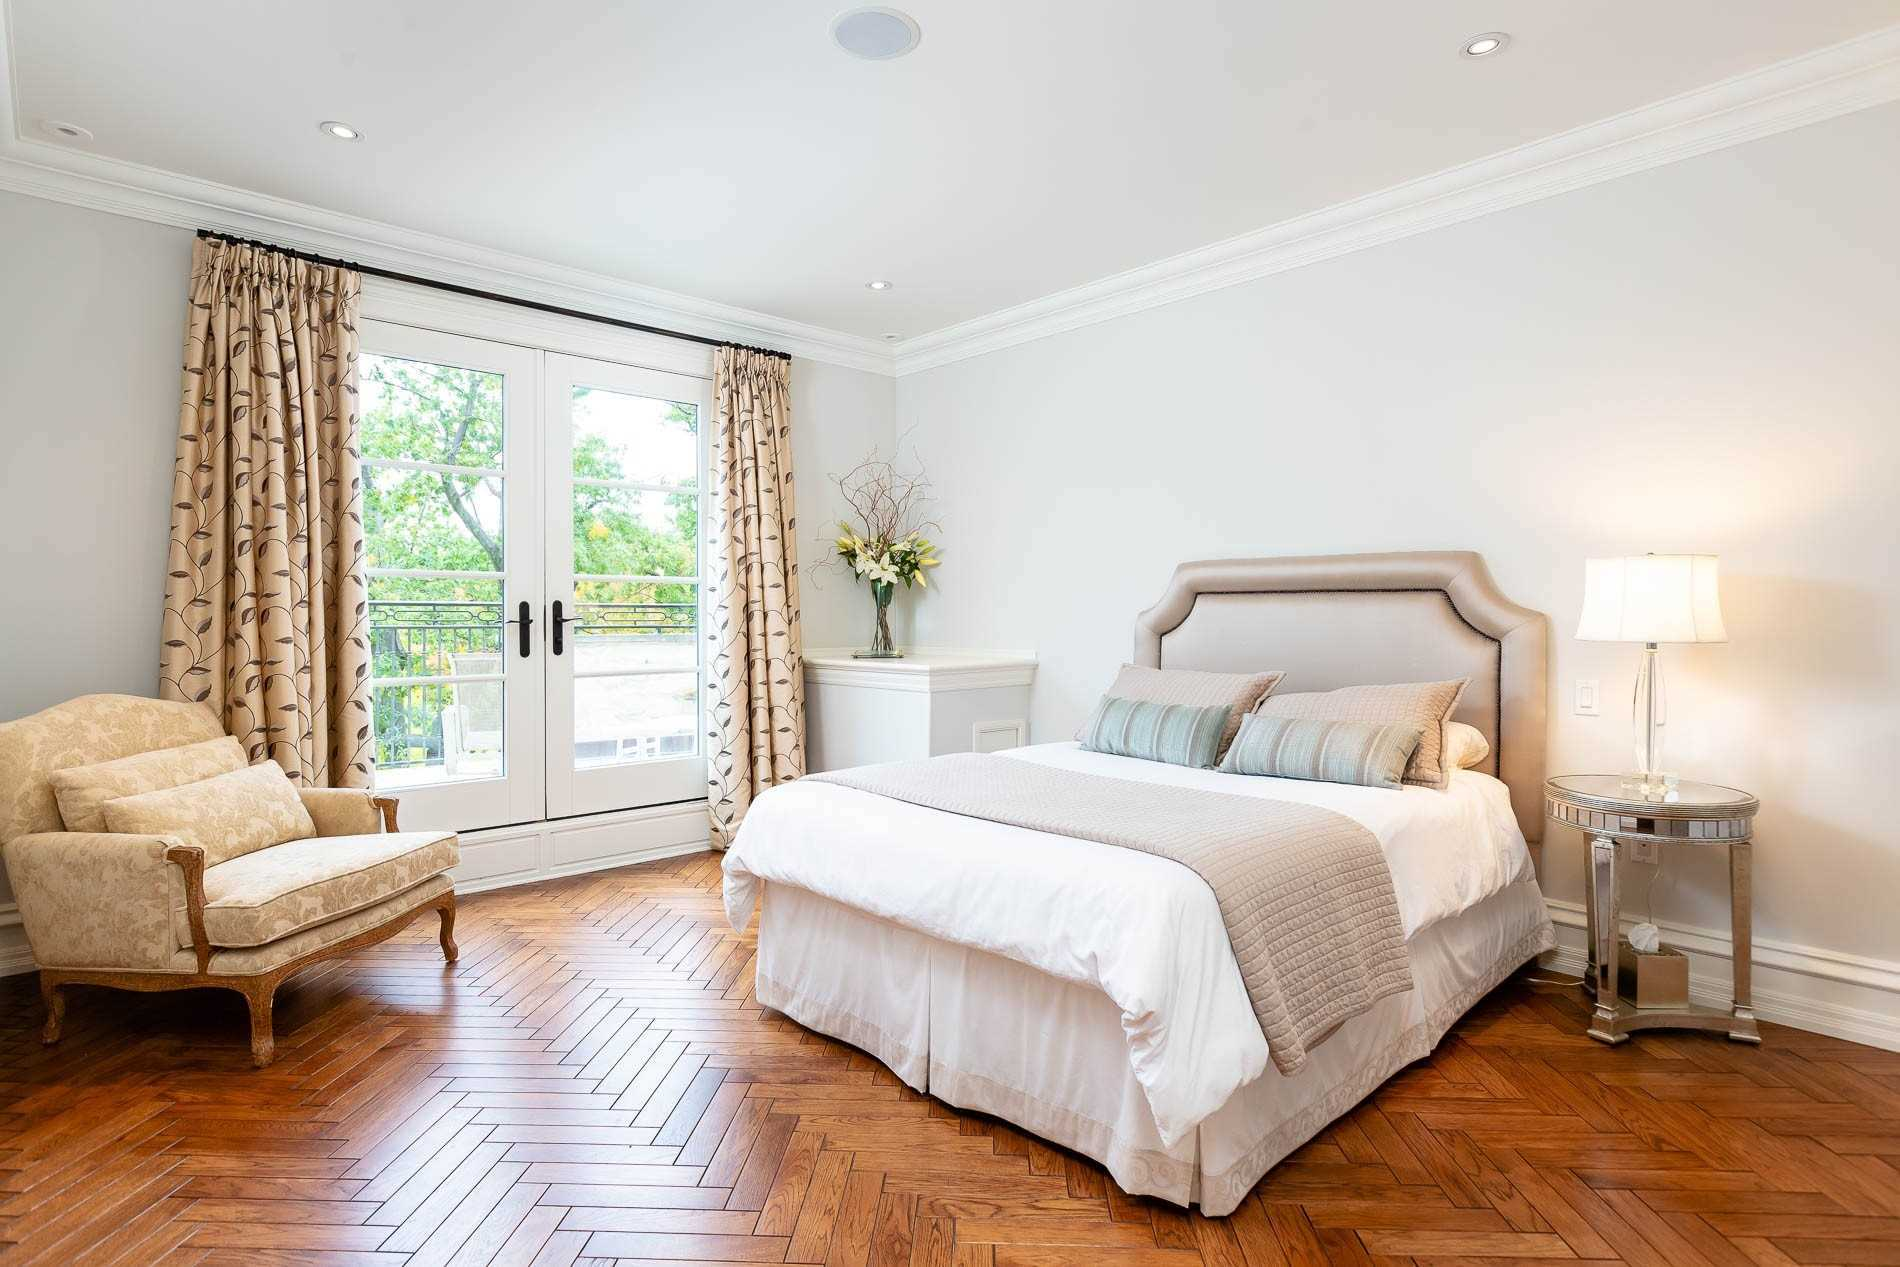 1343 Blythe Rd, Mississauga, Ontario L5H2C2, 7 Bedrooms Bedrooms, 16 Rooms Rooms,9 BathroomsBathrooms,Detached,For Sale,Blythe,W5176040